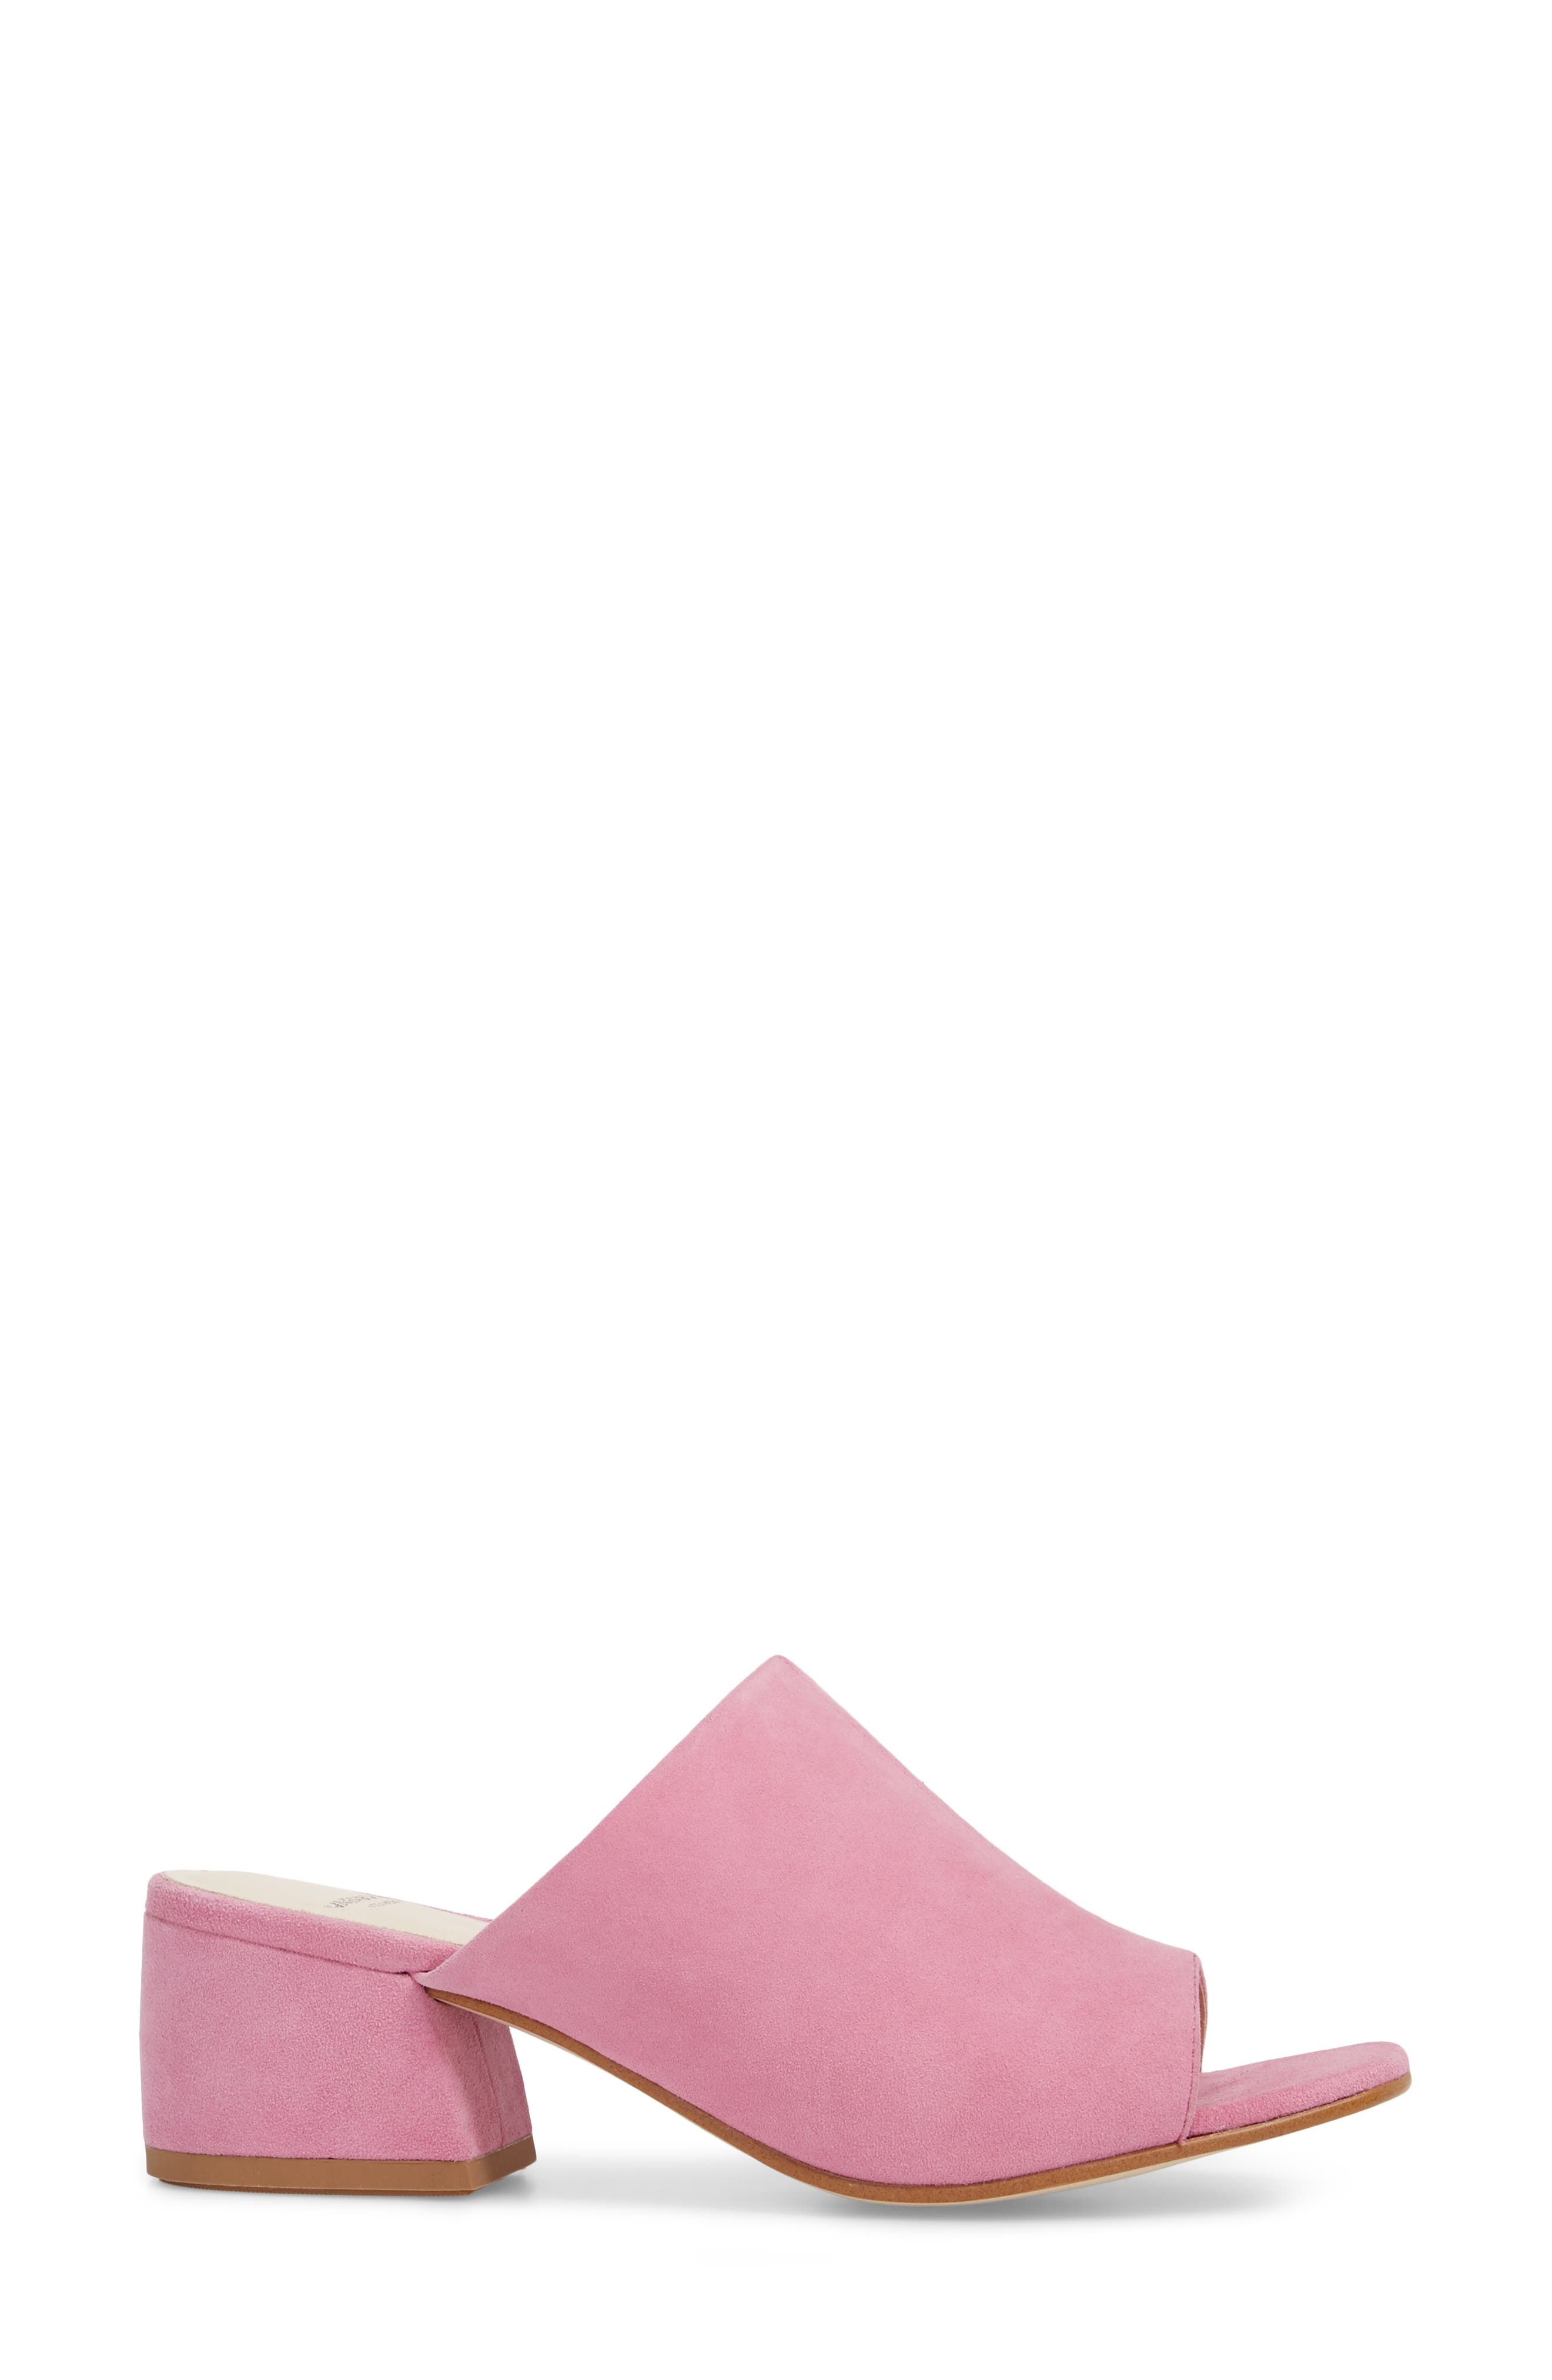 Saide Slide Sandal,                             Alternate thumbnail 3, color,                             Pink Suede